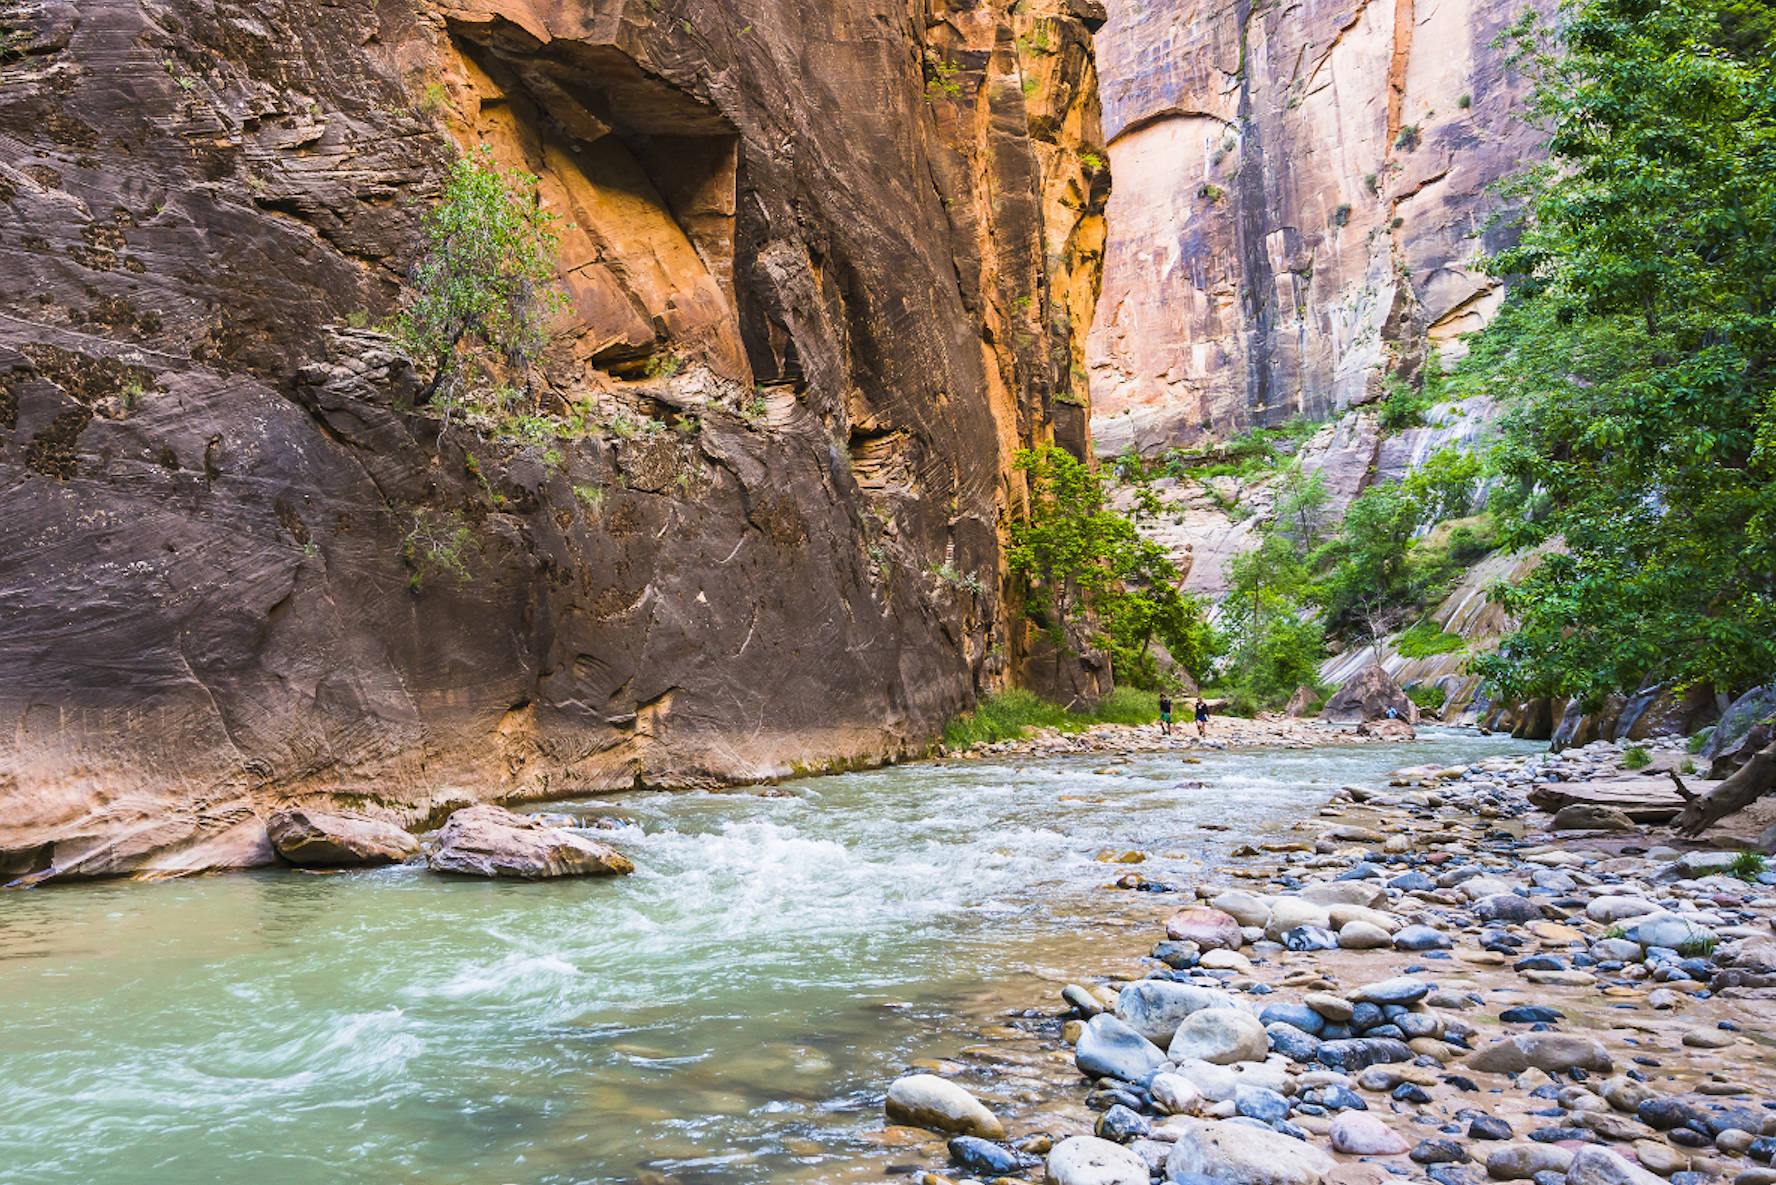 Gap Year Program - ARCC Gap | Southwest: Utah, Colorado, New Mexico, Arizona & California  6